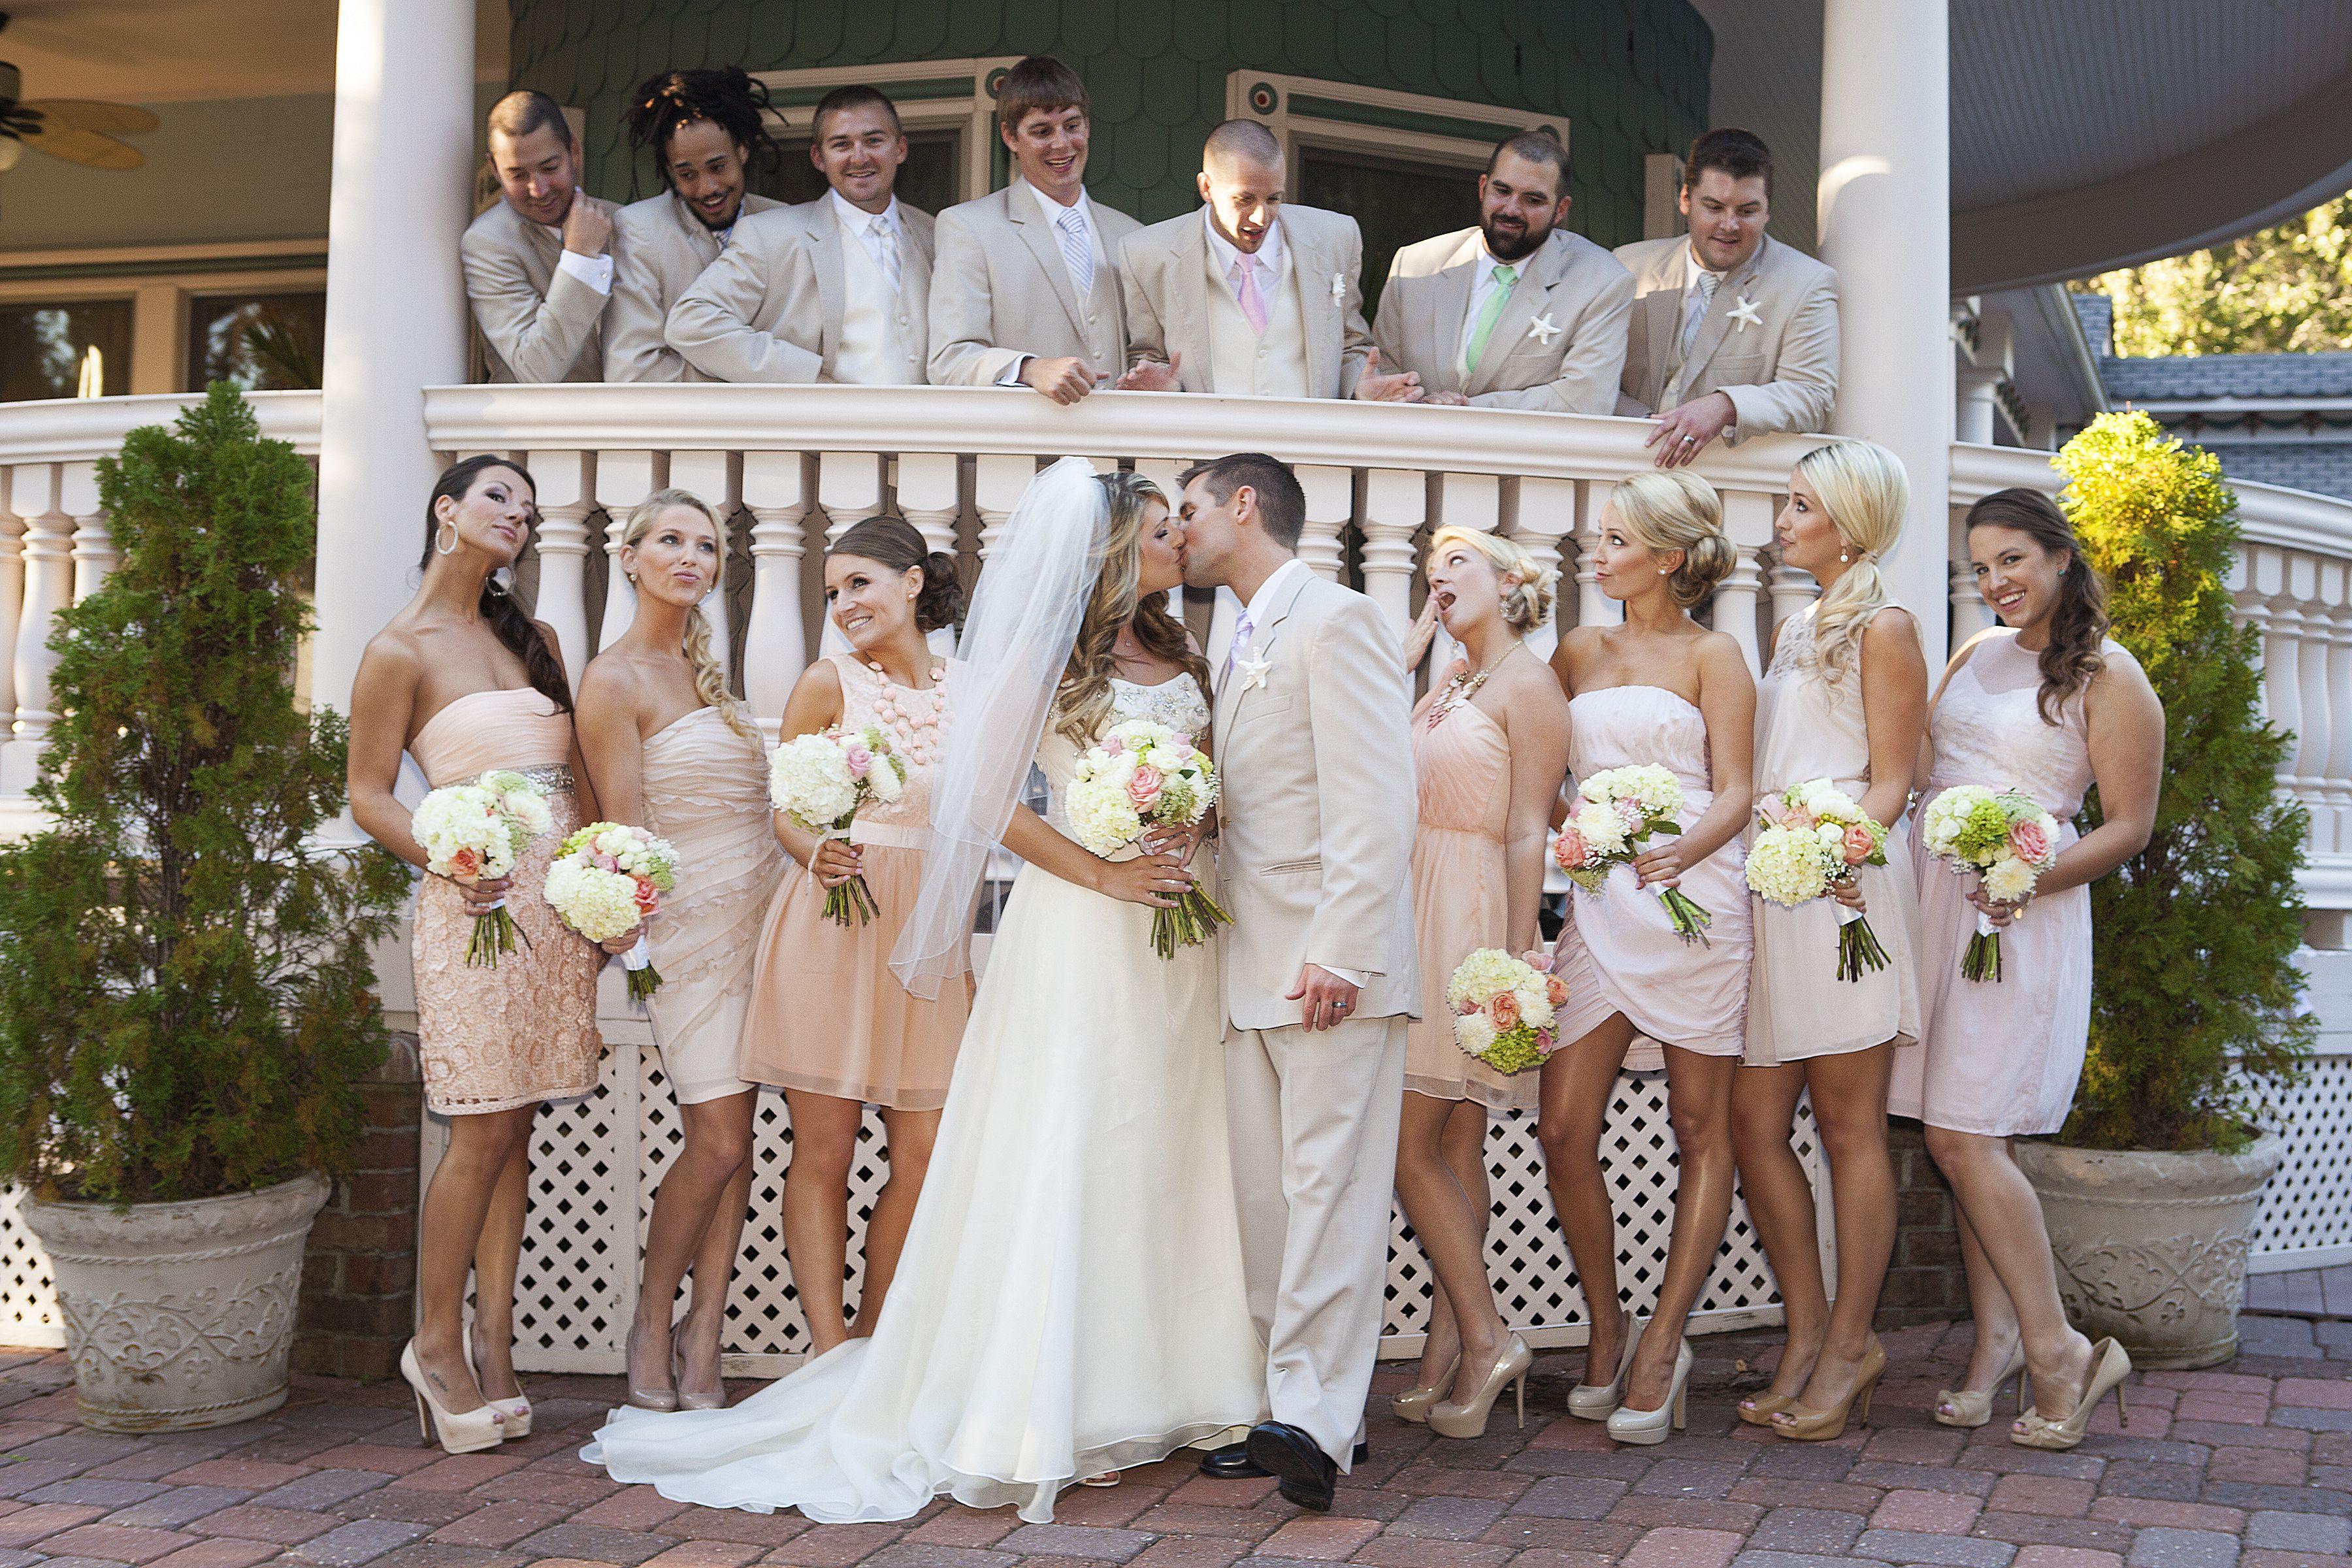 Blush bridesmaid dresses and khaki groomsmen outfits each blush bridesmaid dresses and khaki groomsmen outfits each bridesmaid had a different style blush dress ombrellifo Images